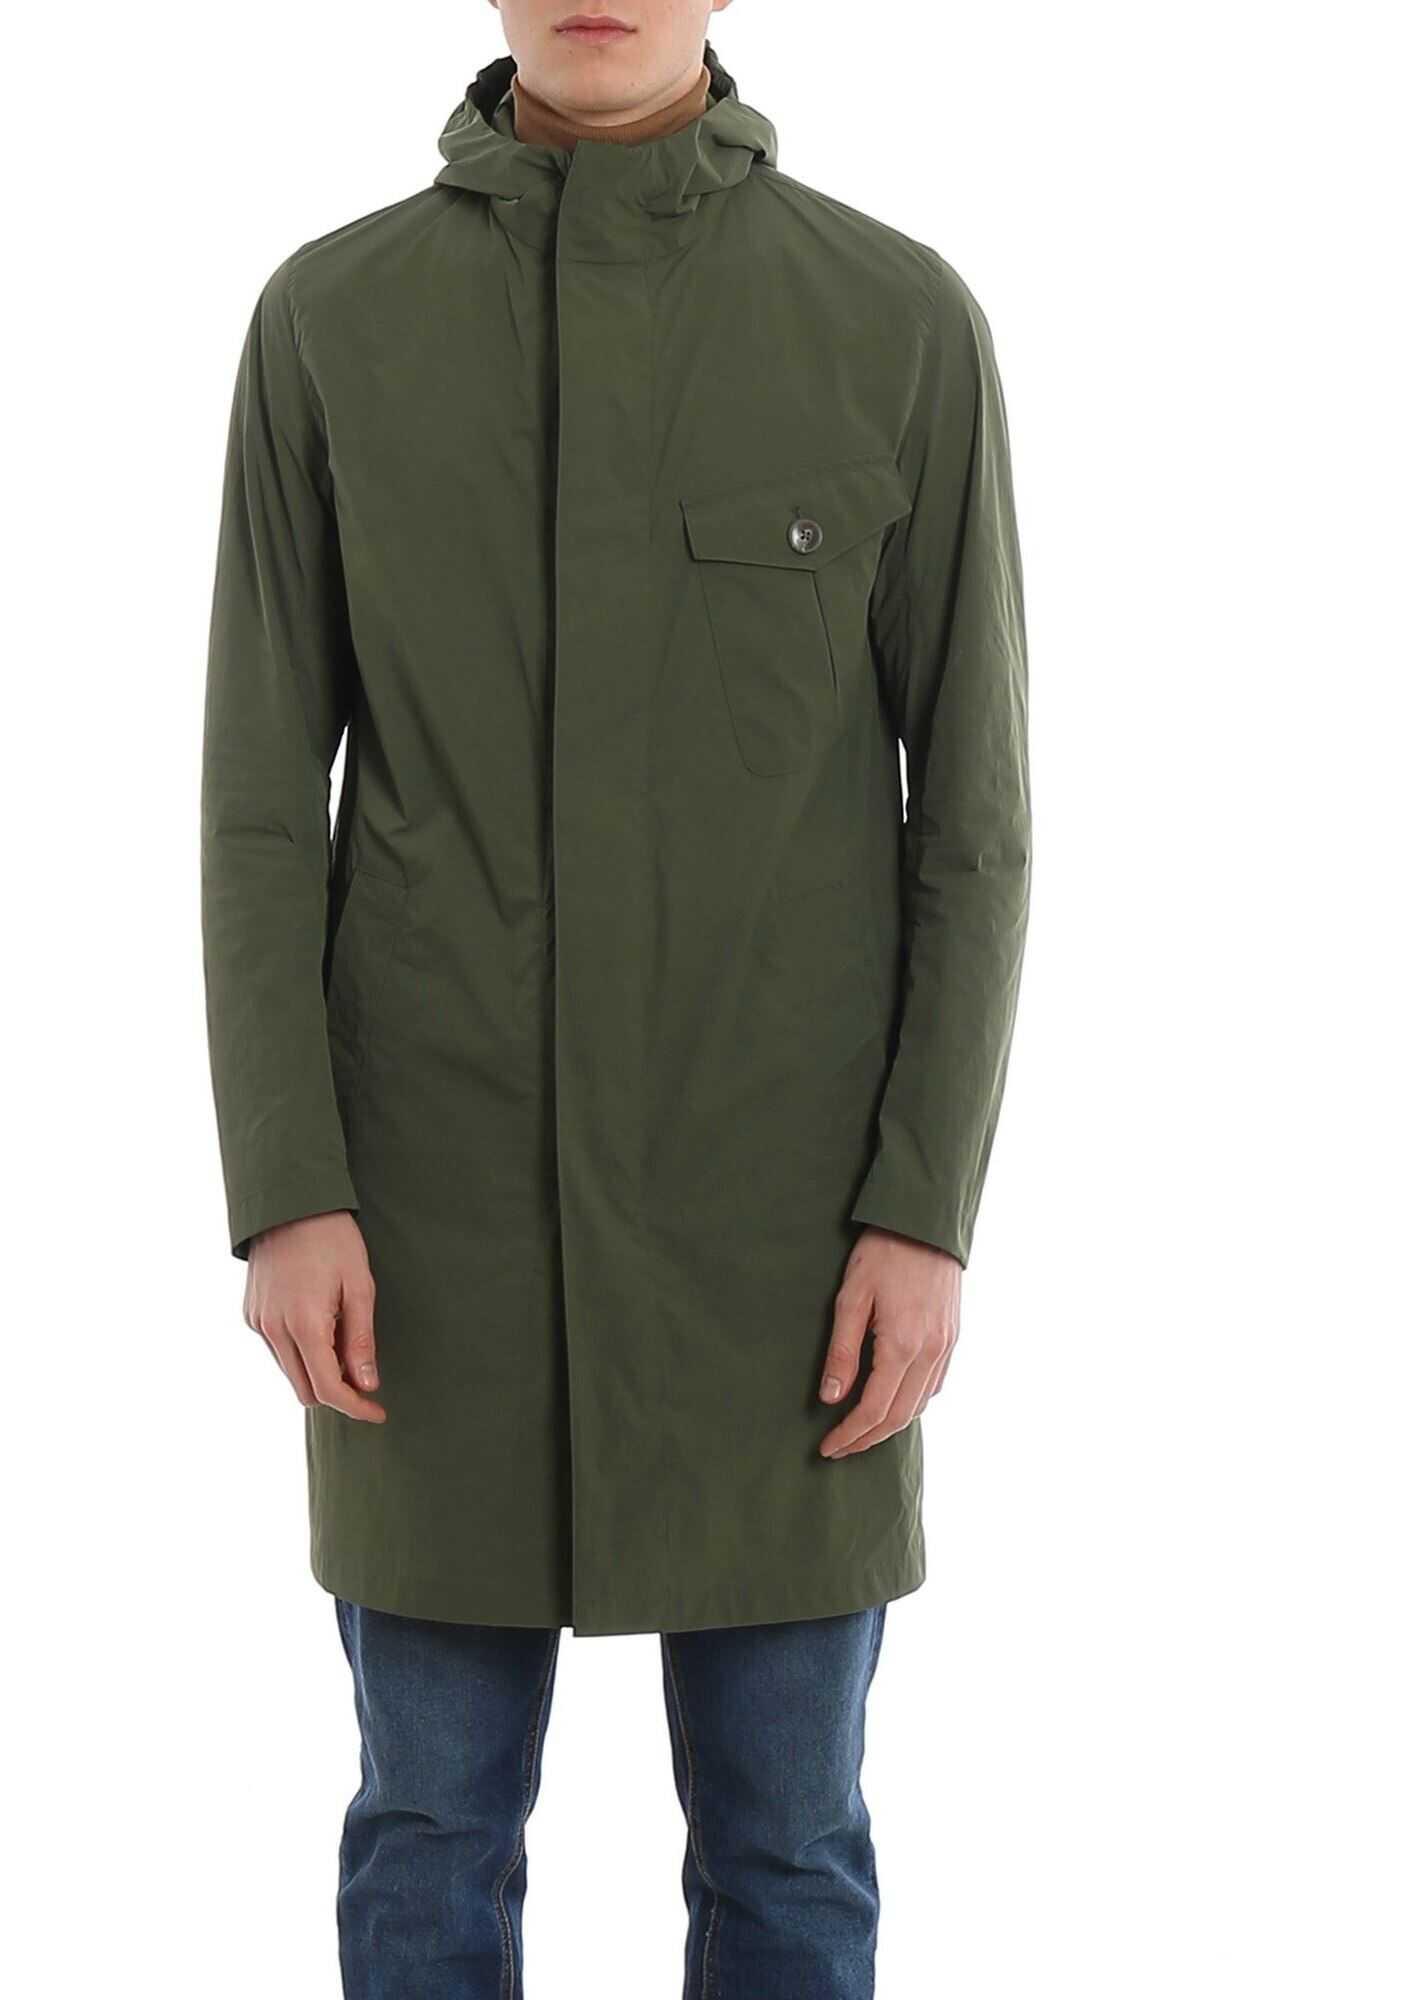 Herno Asymmetrical Zip Fastening Coat In Green Green imagine